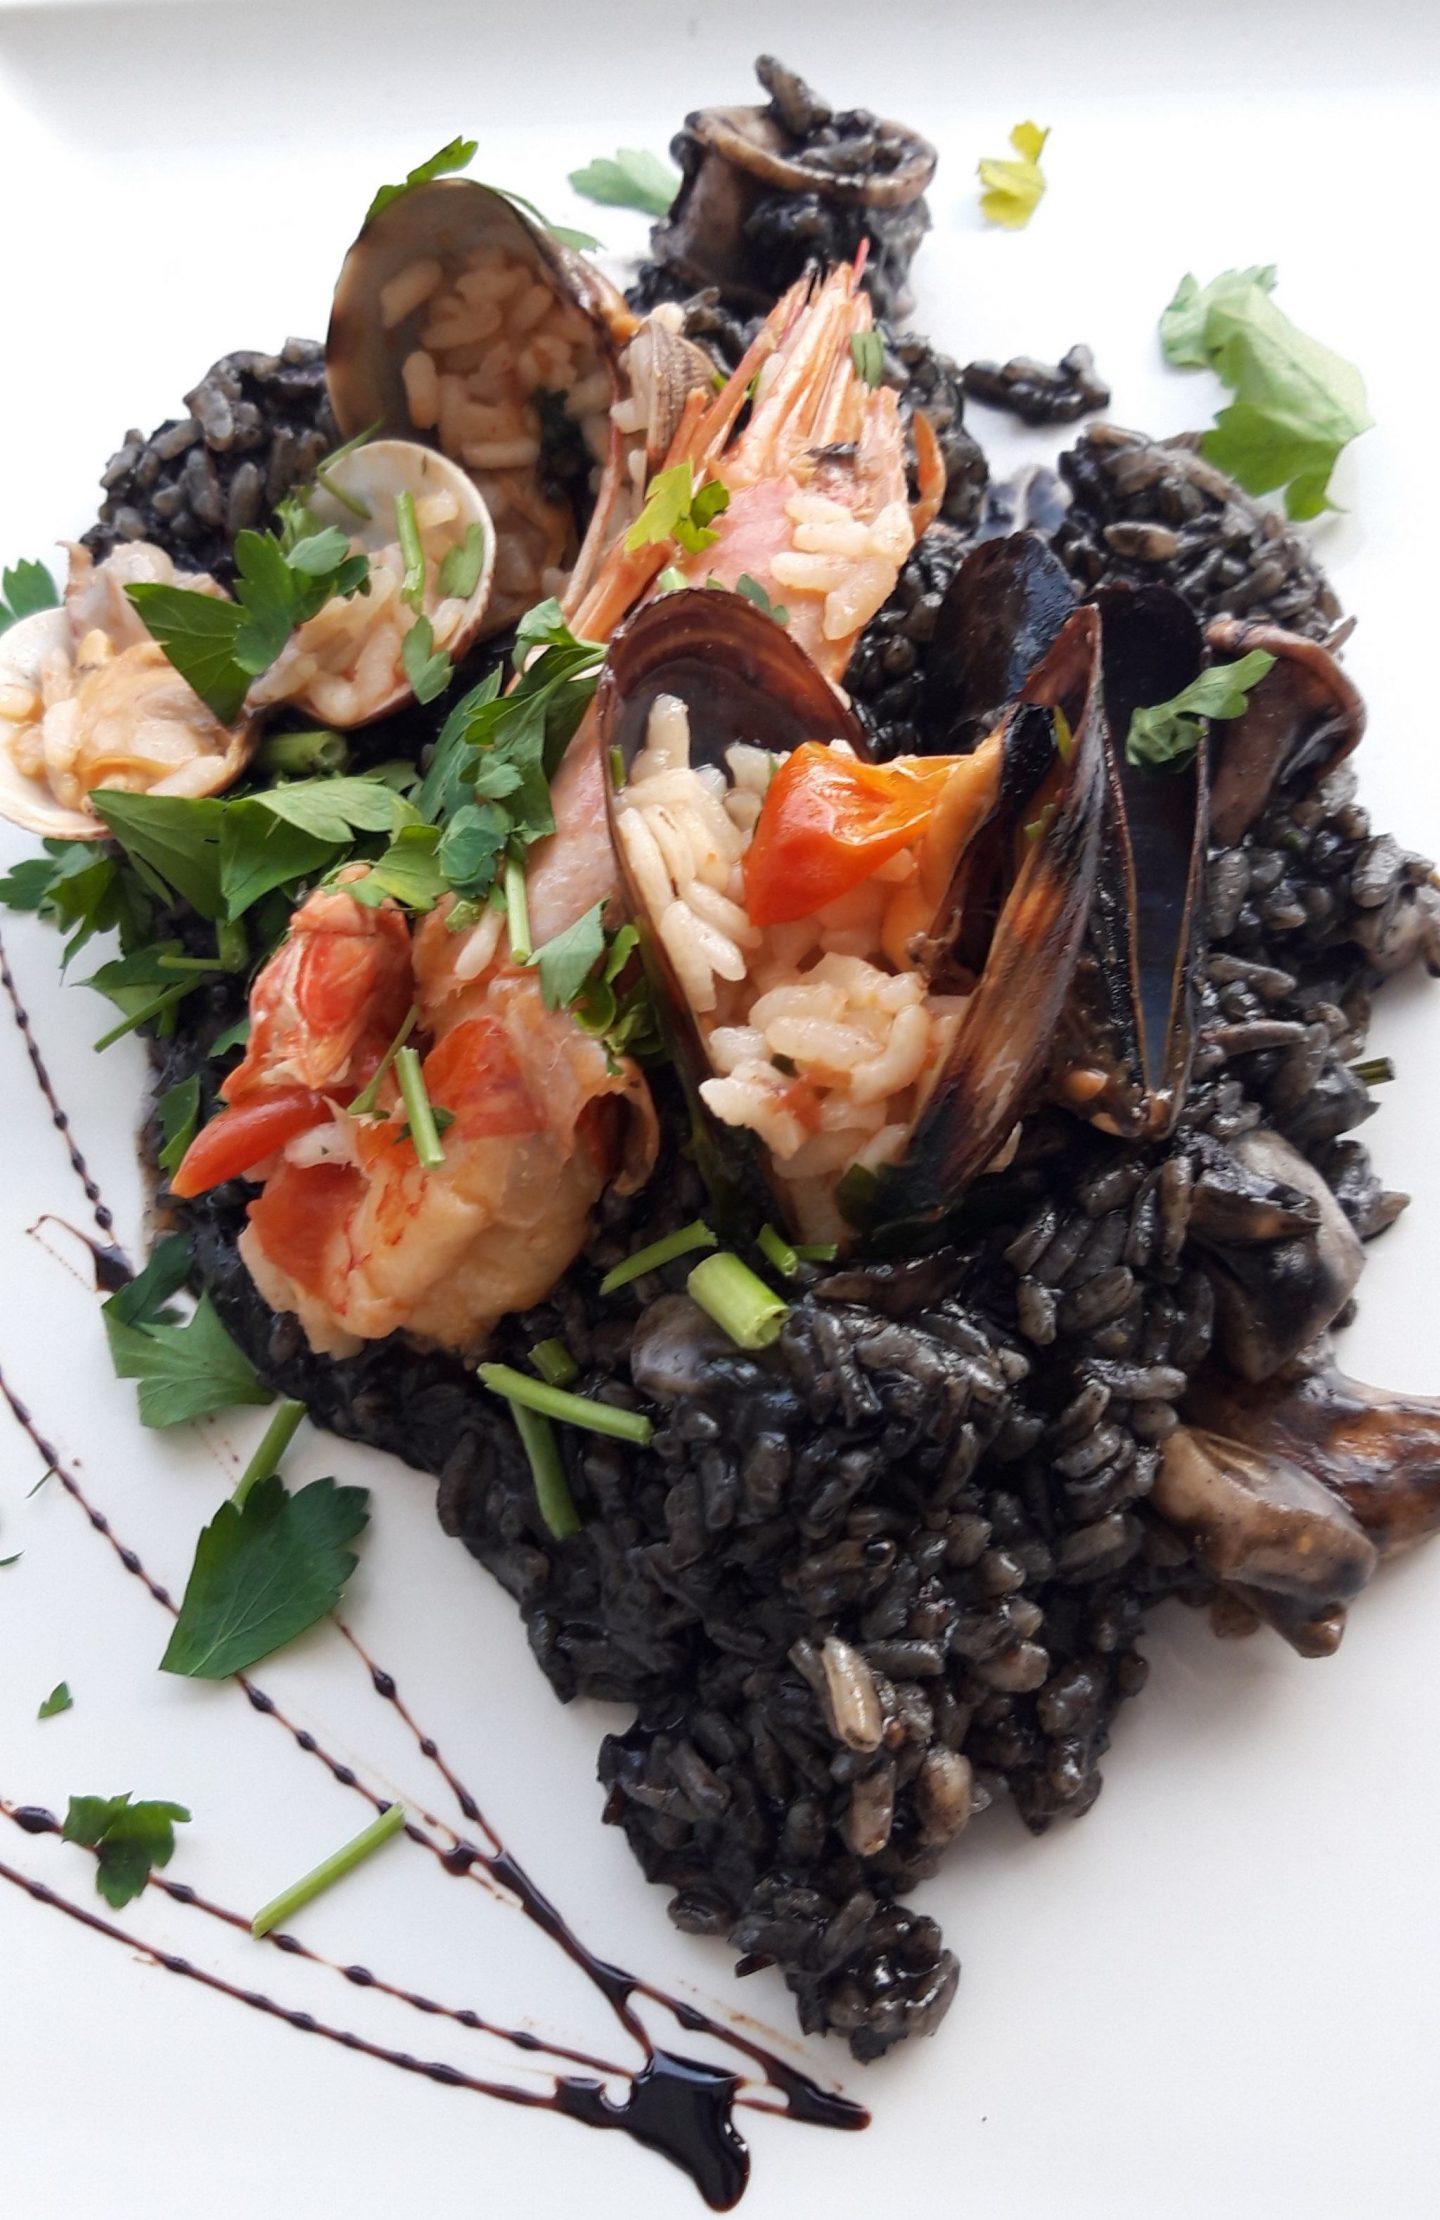 Erfahrung Kritik Bewertung Risotto Nero Restaurant Almare Ciutat Jardi Palma de Mallorca Foodblog Sternestulle